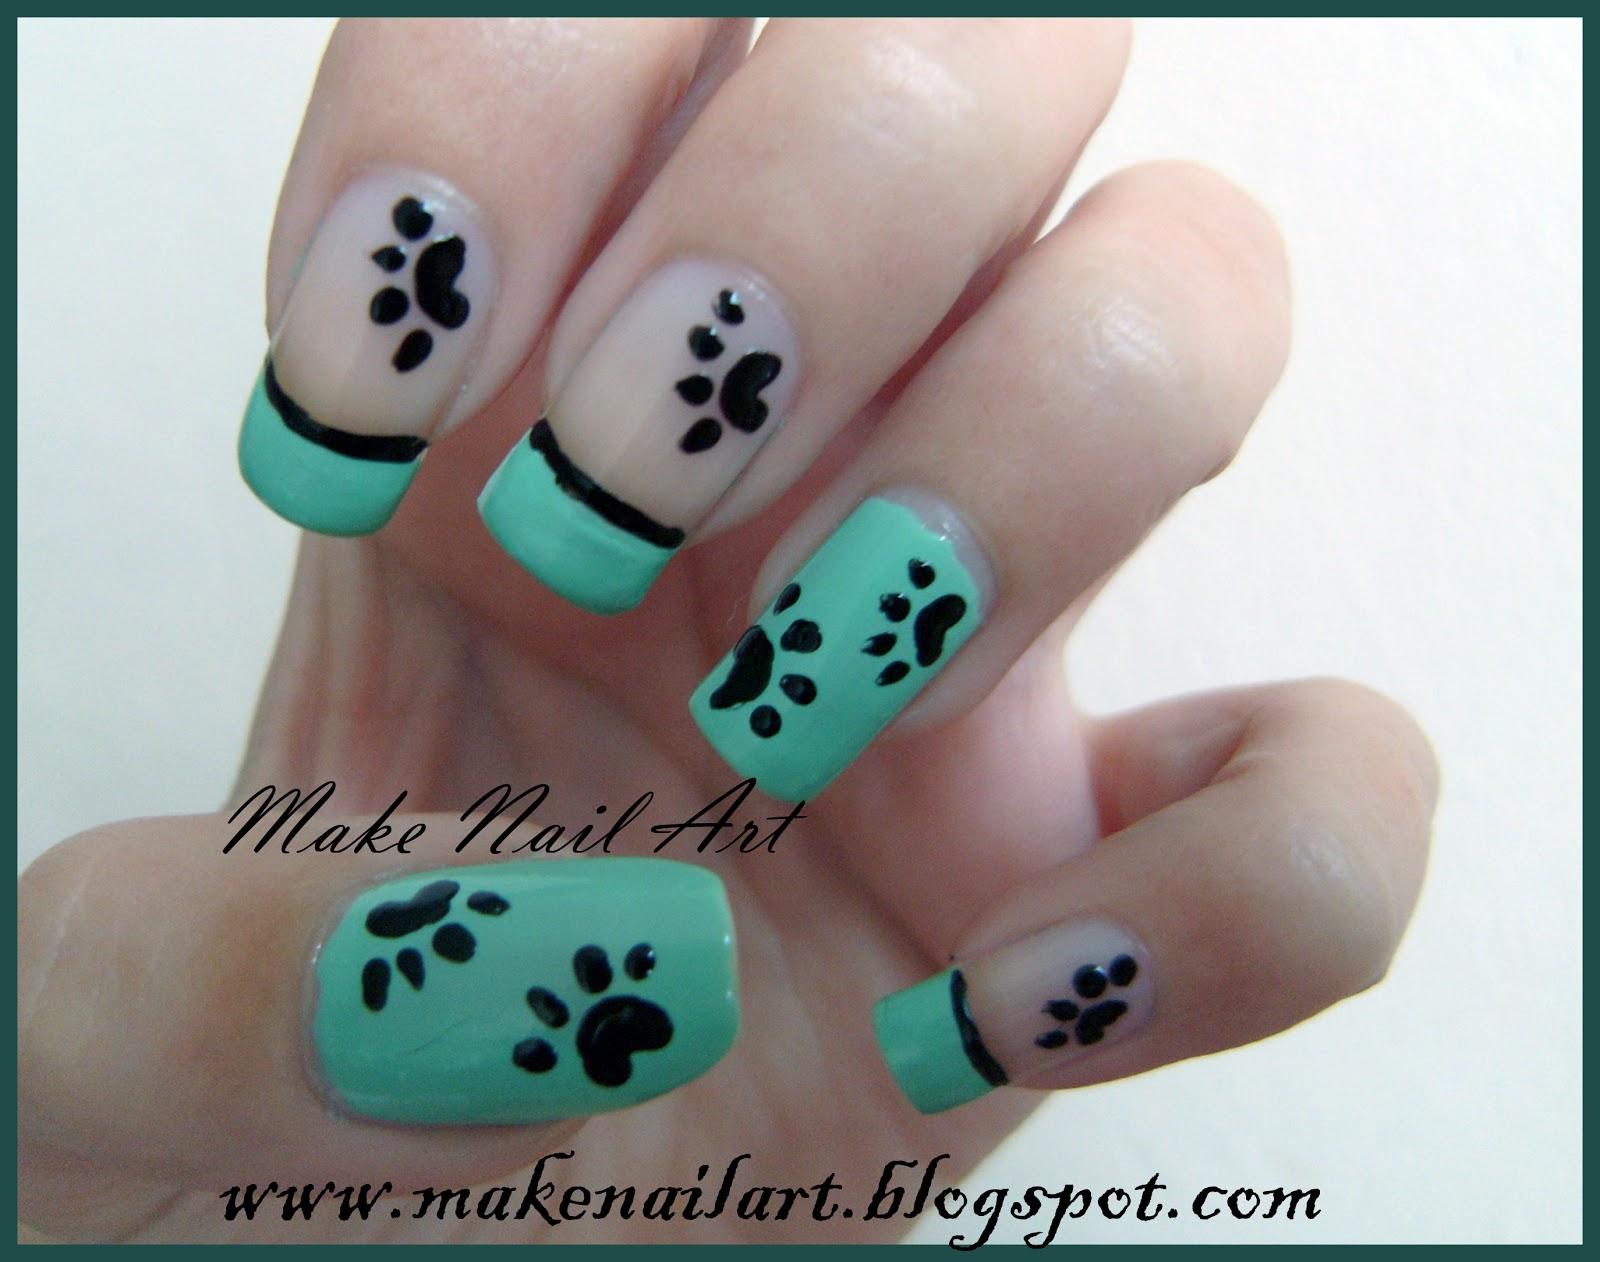 Make nail art simple and cute paws nail art tutorial simple and cute paws nail art tutorial prinsesfo Image collections